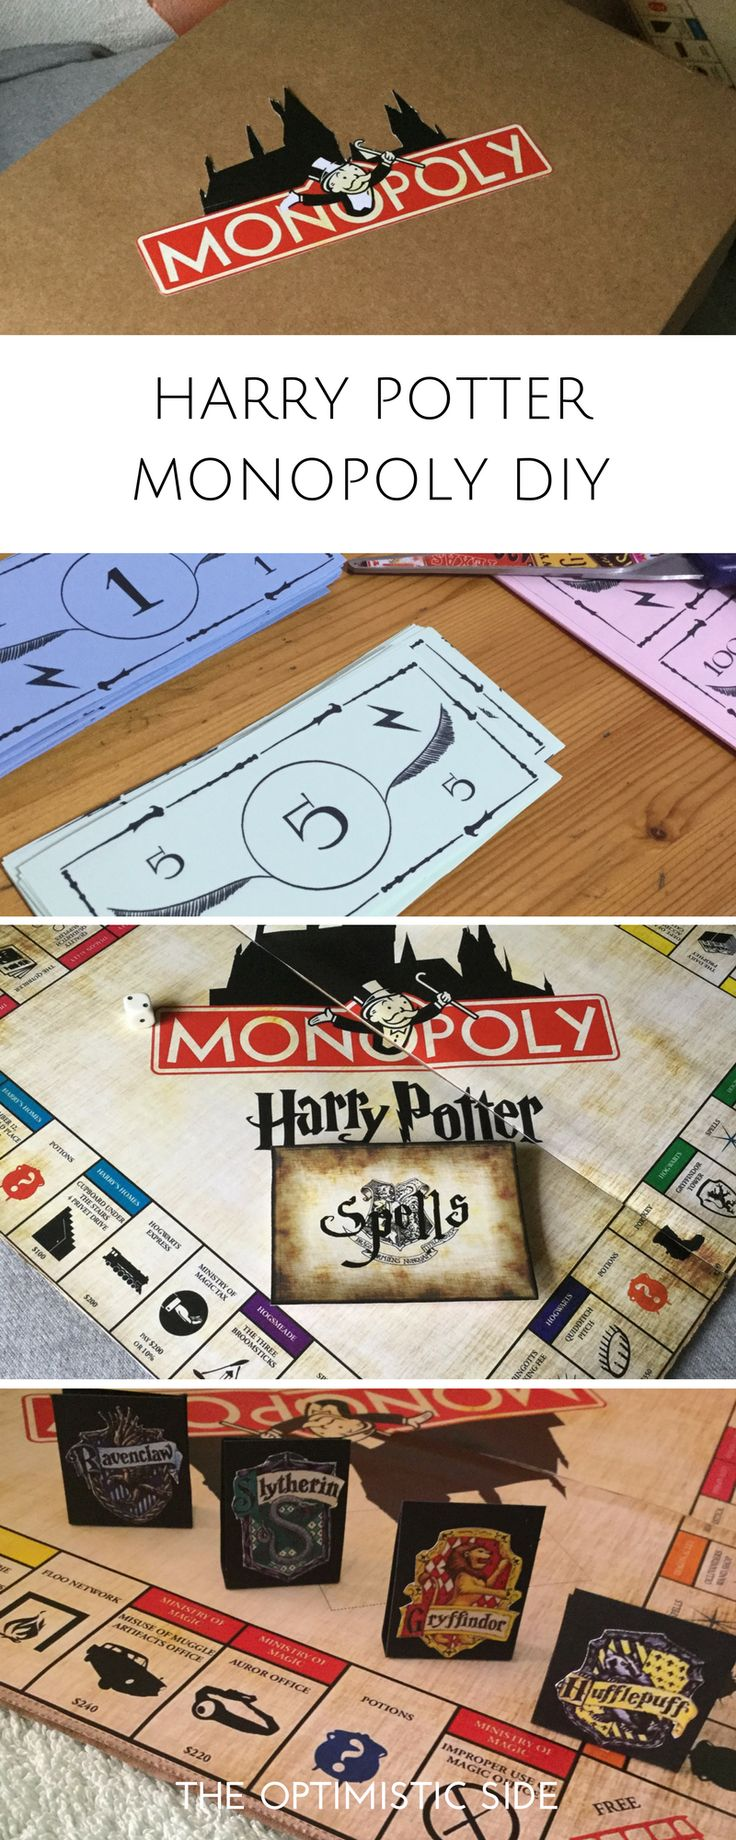 337 best images about harry and ginny on pinterest harry birthday - Regalo Diy Harry Potter Monopoly Para Amigo Amiga Novio Novia Fans